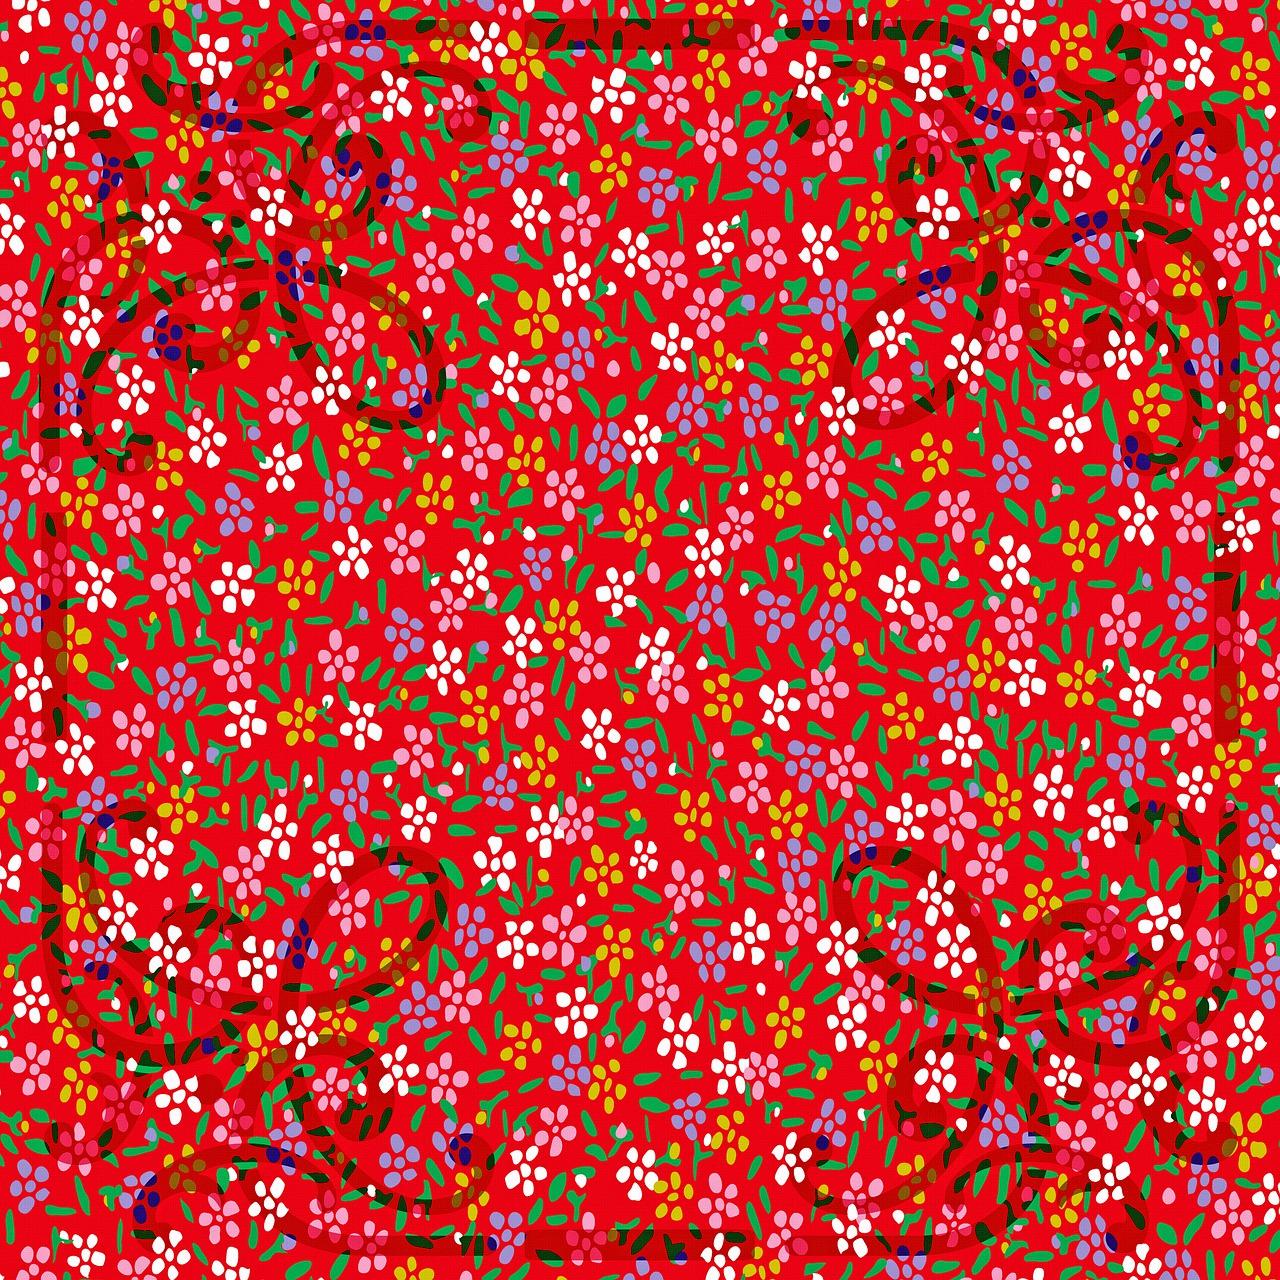 Japanese Floral Background Flower Free Image On Pixabay